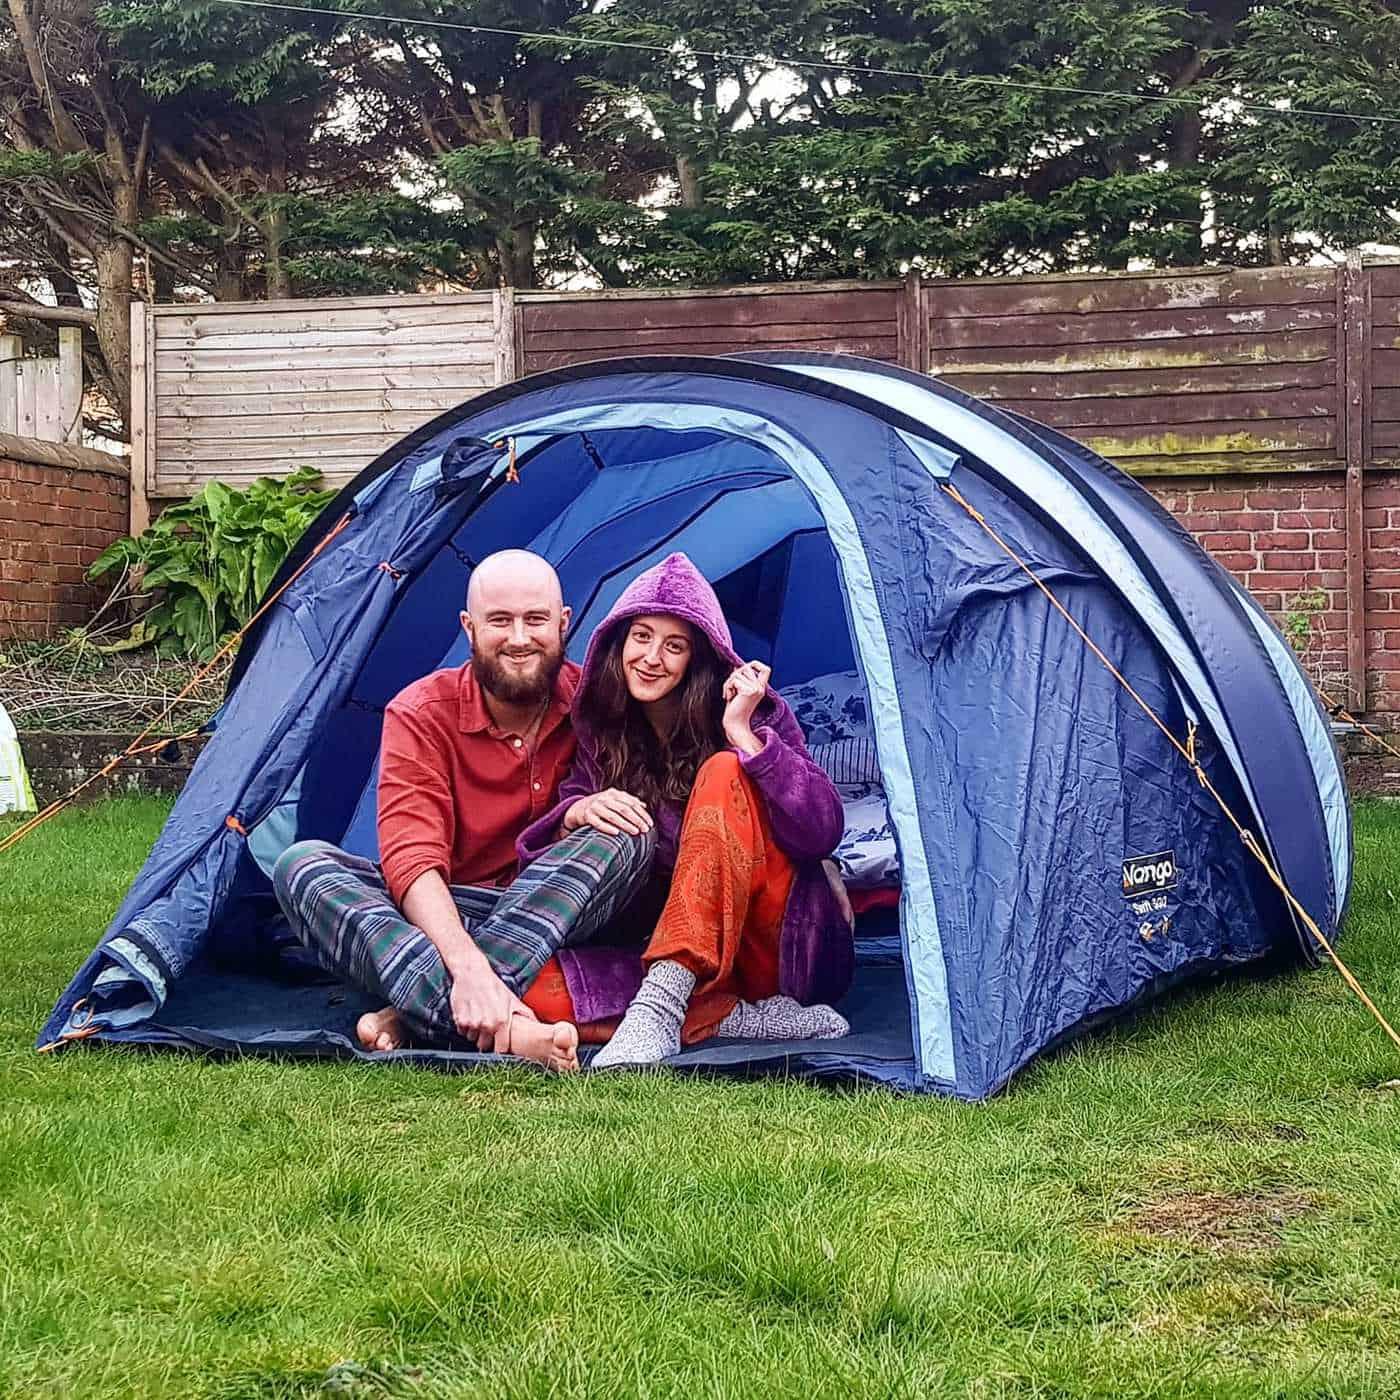 A couple camping in their back garden.